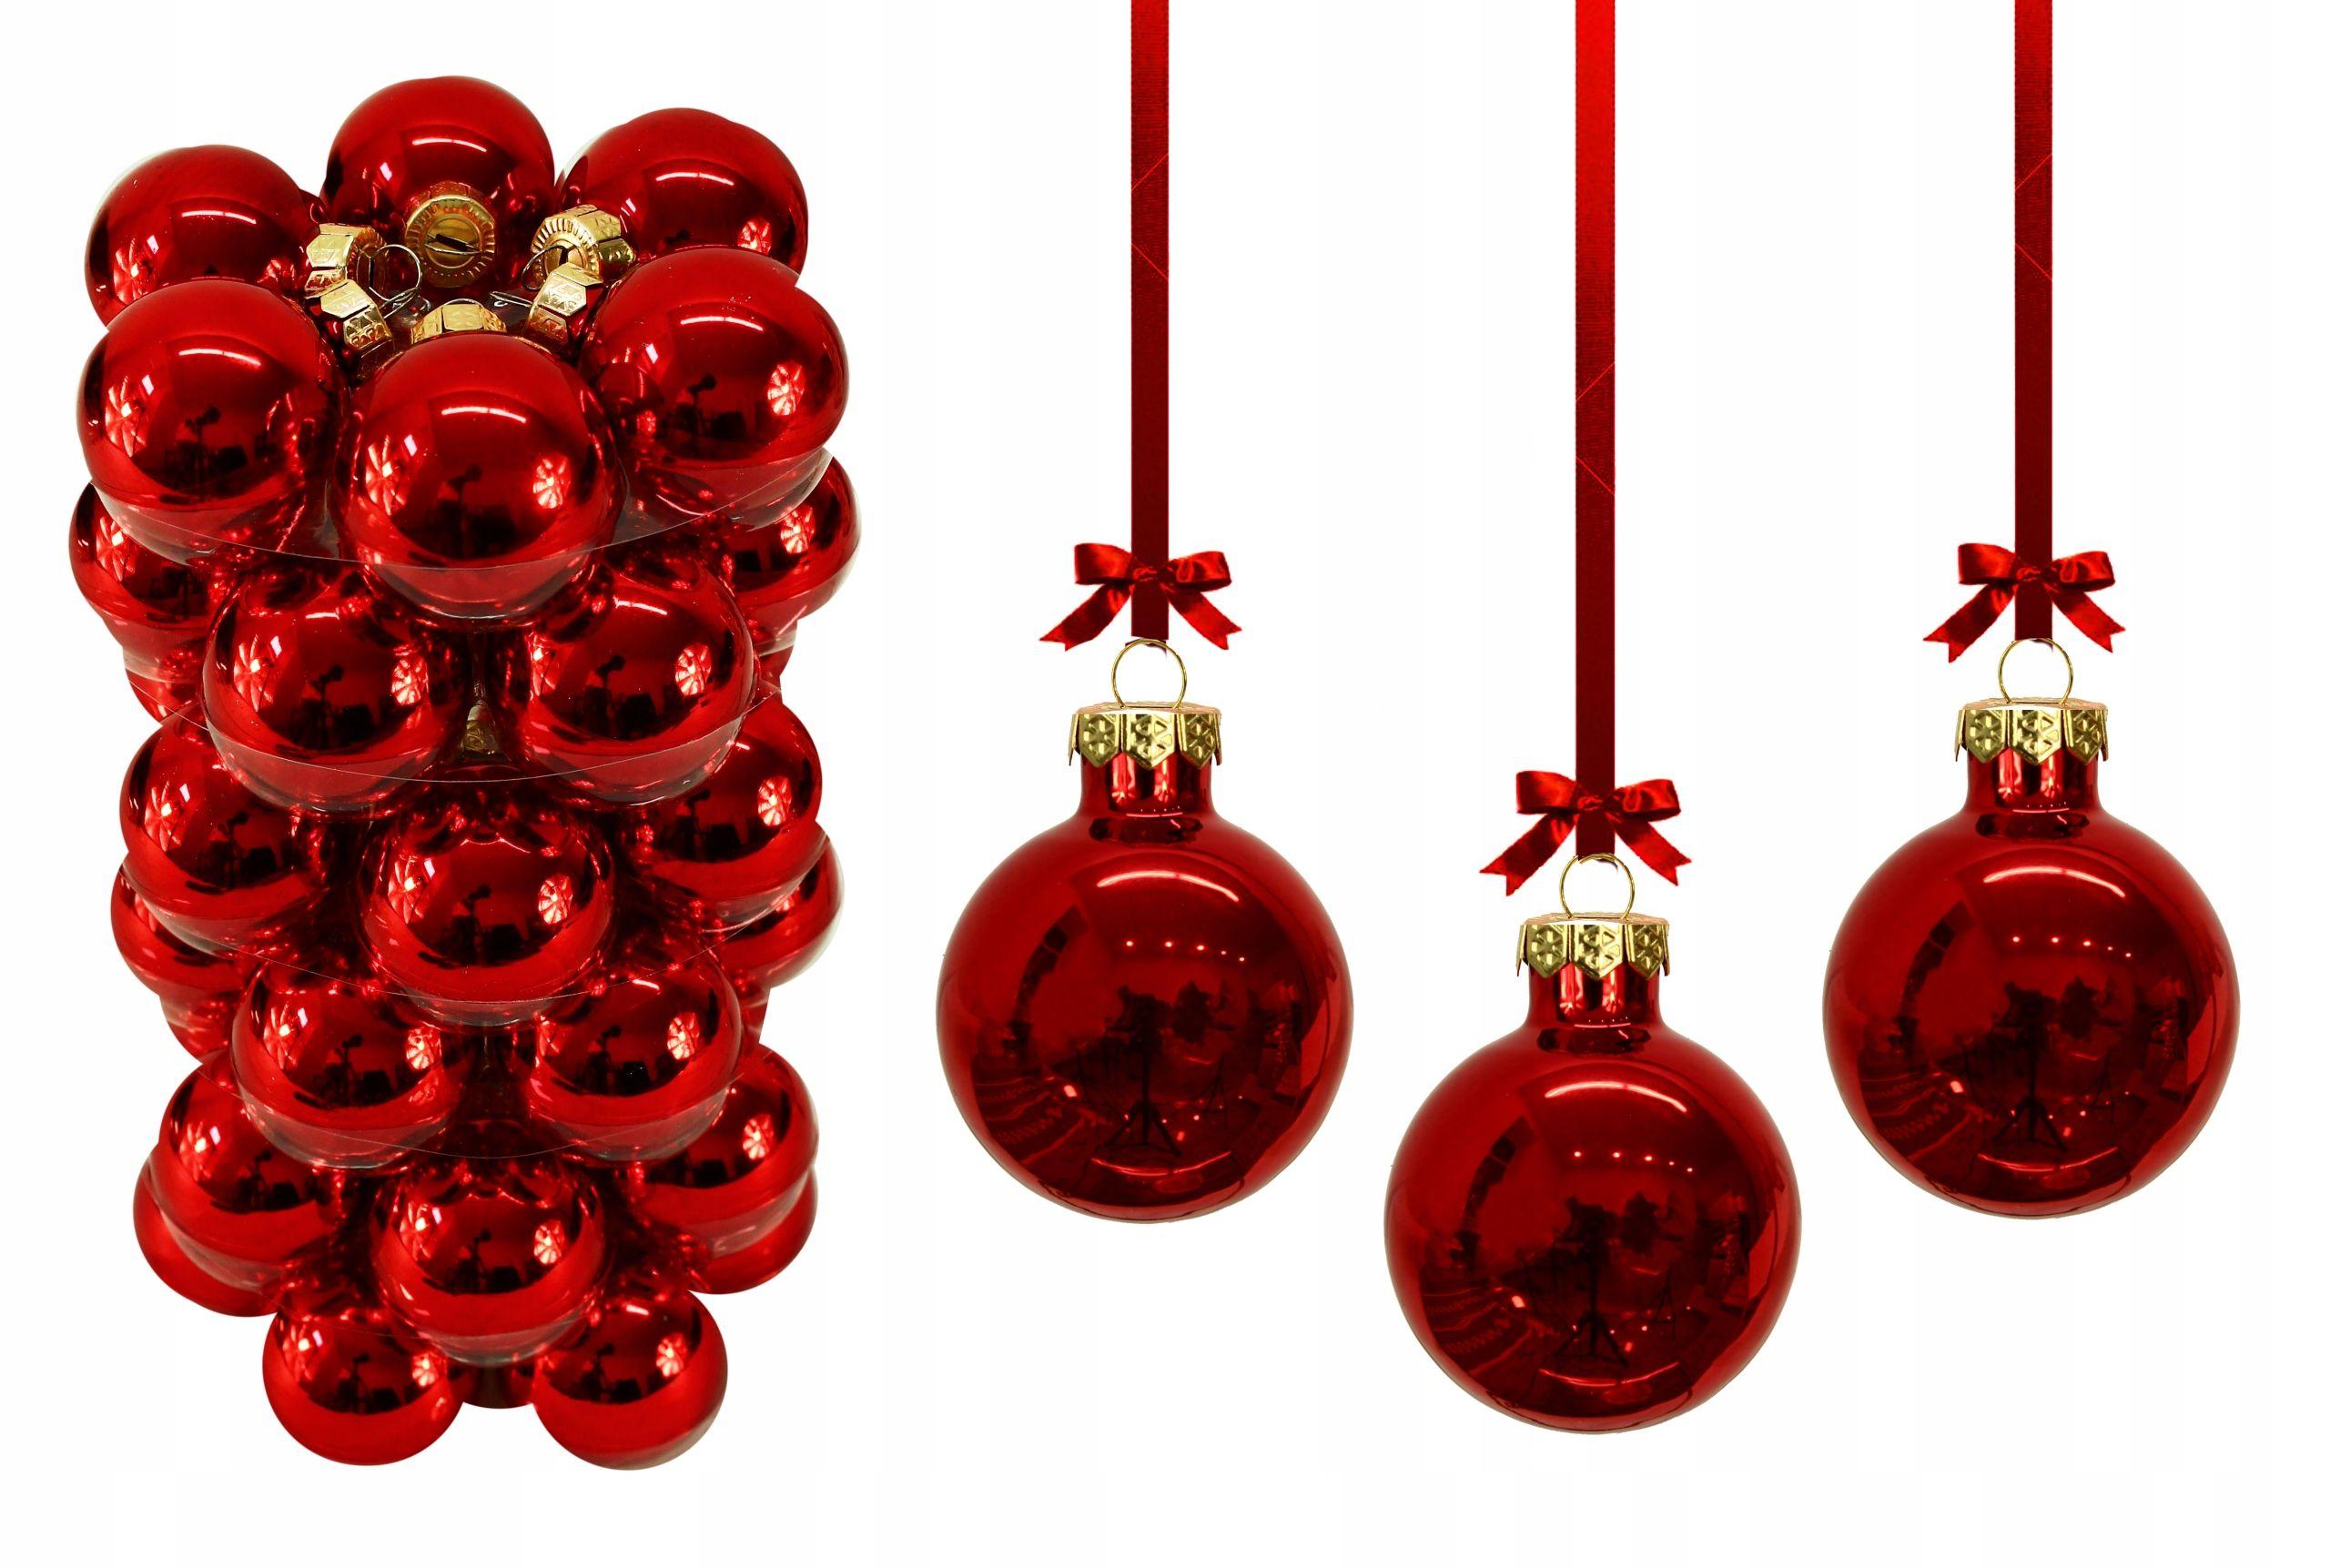 Bombki Swieta Choinka Ozdoby 4cm Zestaw 36szt 7570222062 Oficjalne Archiwum Allegro Christmas Ornaments Holiday Decor Novelty Christmas